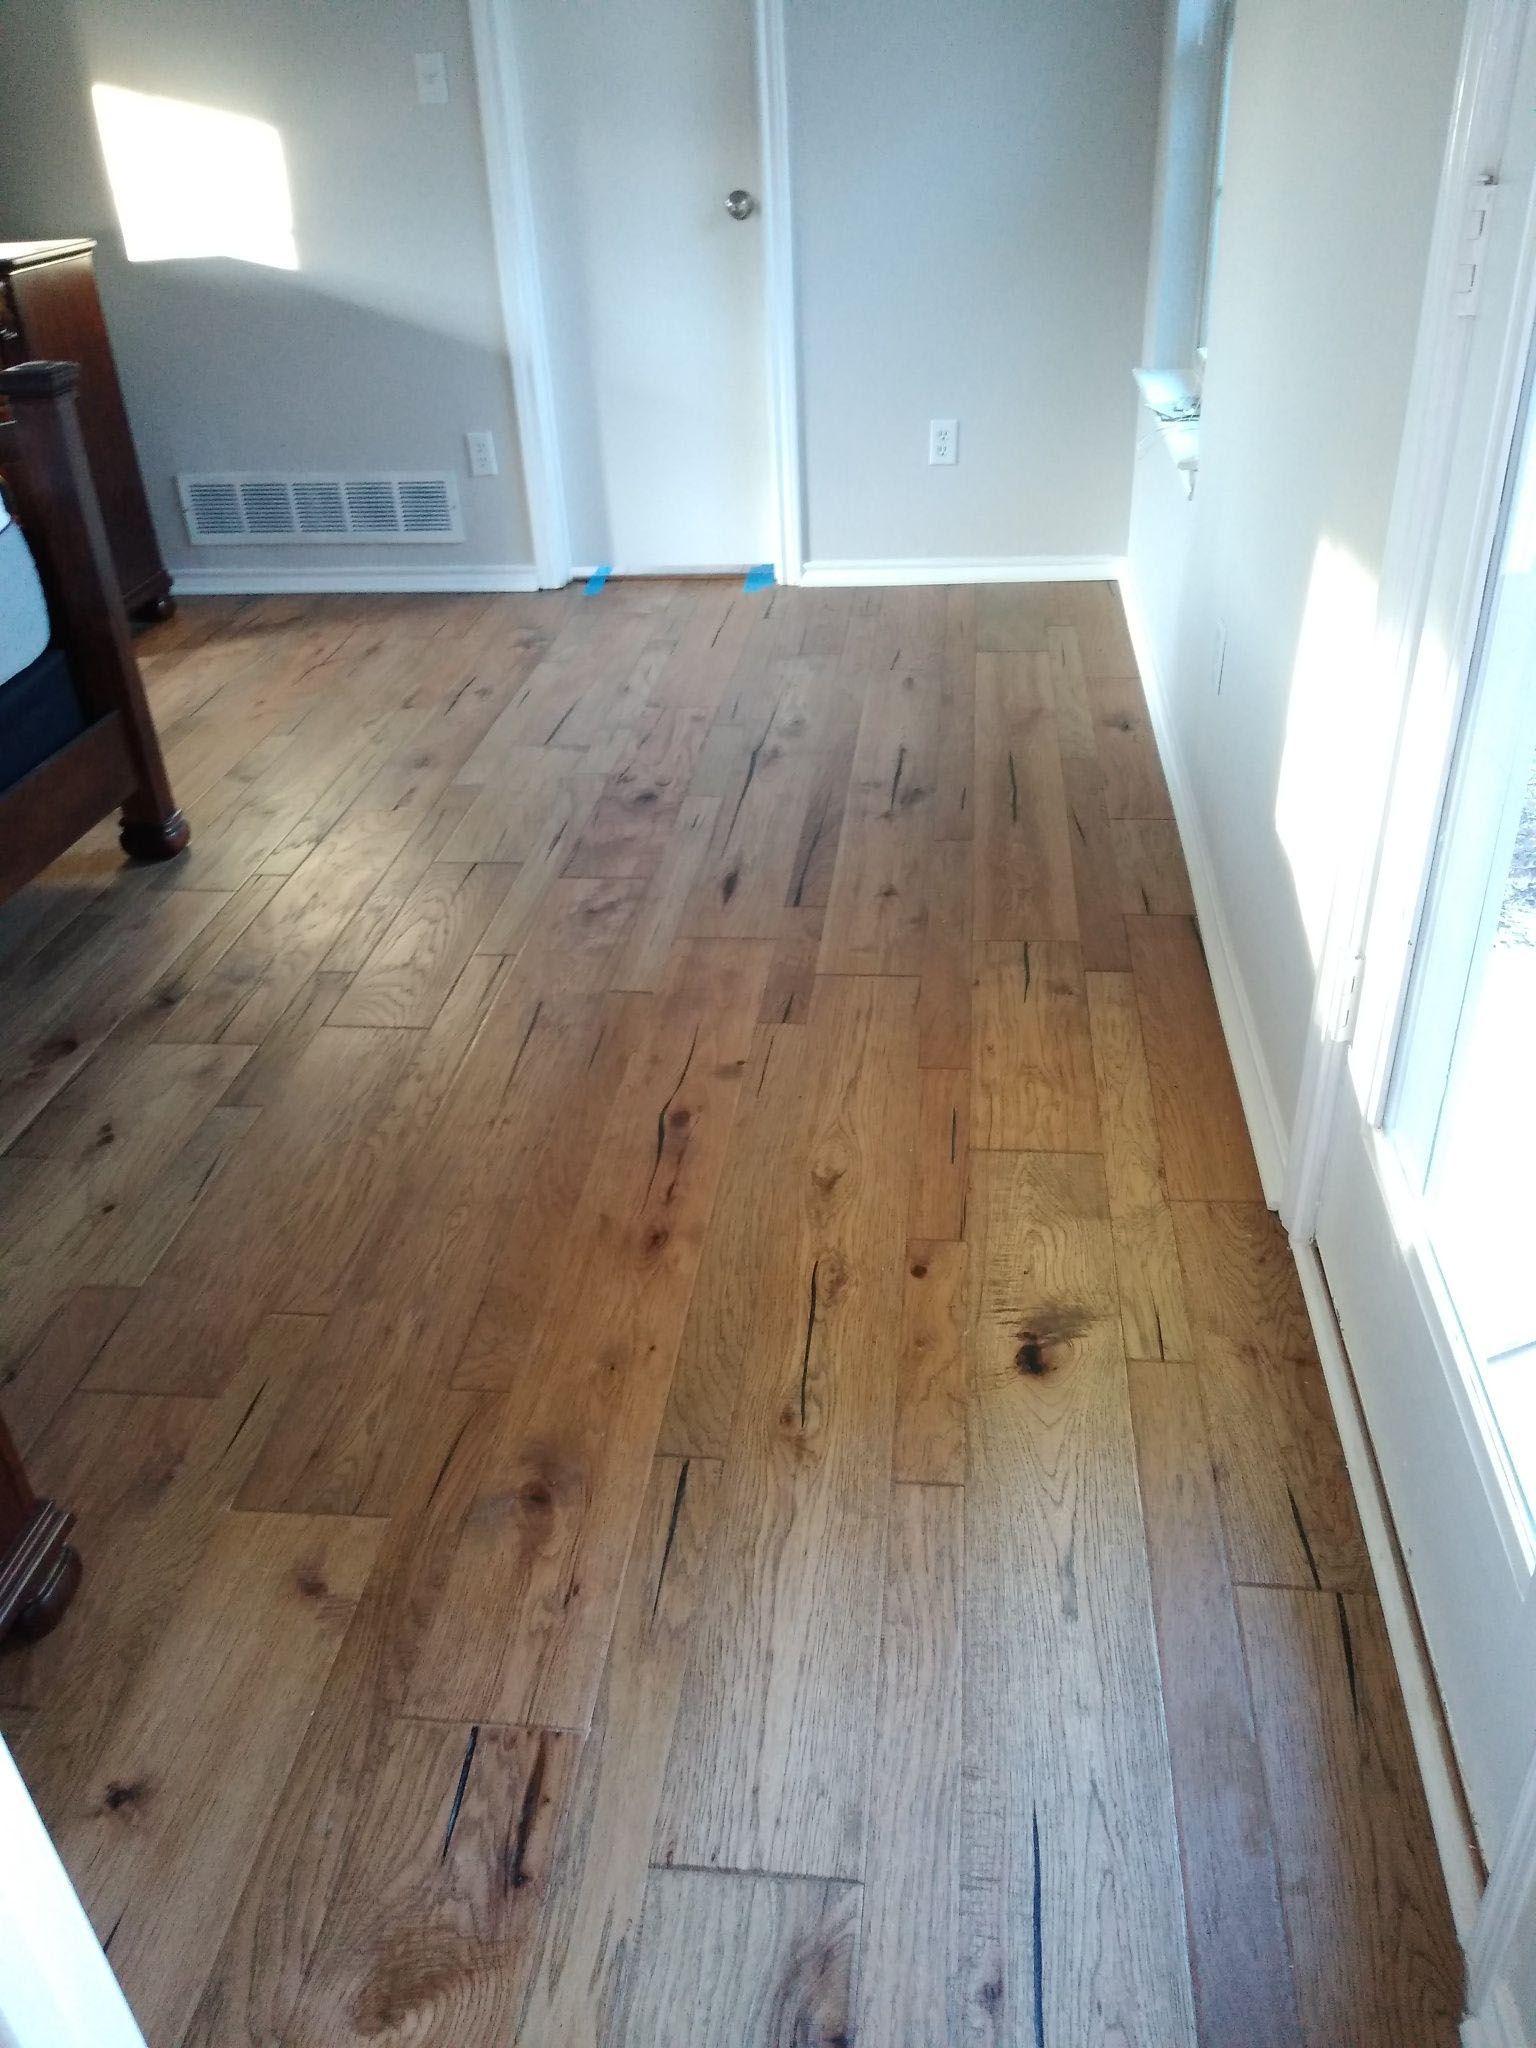 10 Vinyl Floor Living Space Concepts Vinyl Plank Flooring Vinyl Plank Flooring Kitchen Luxury Vinyl Plank Flooring Kitchen